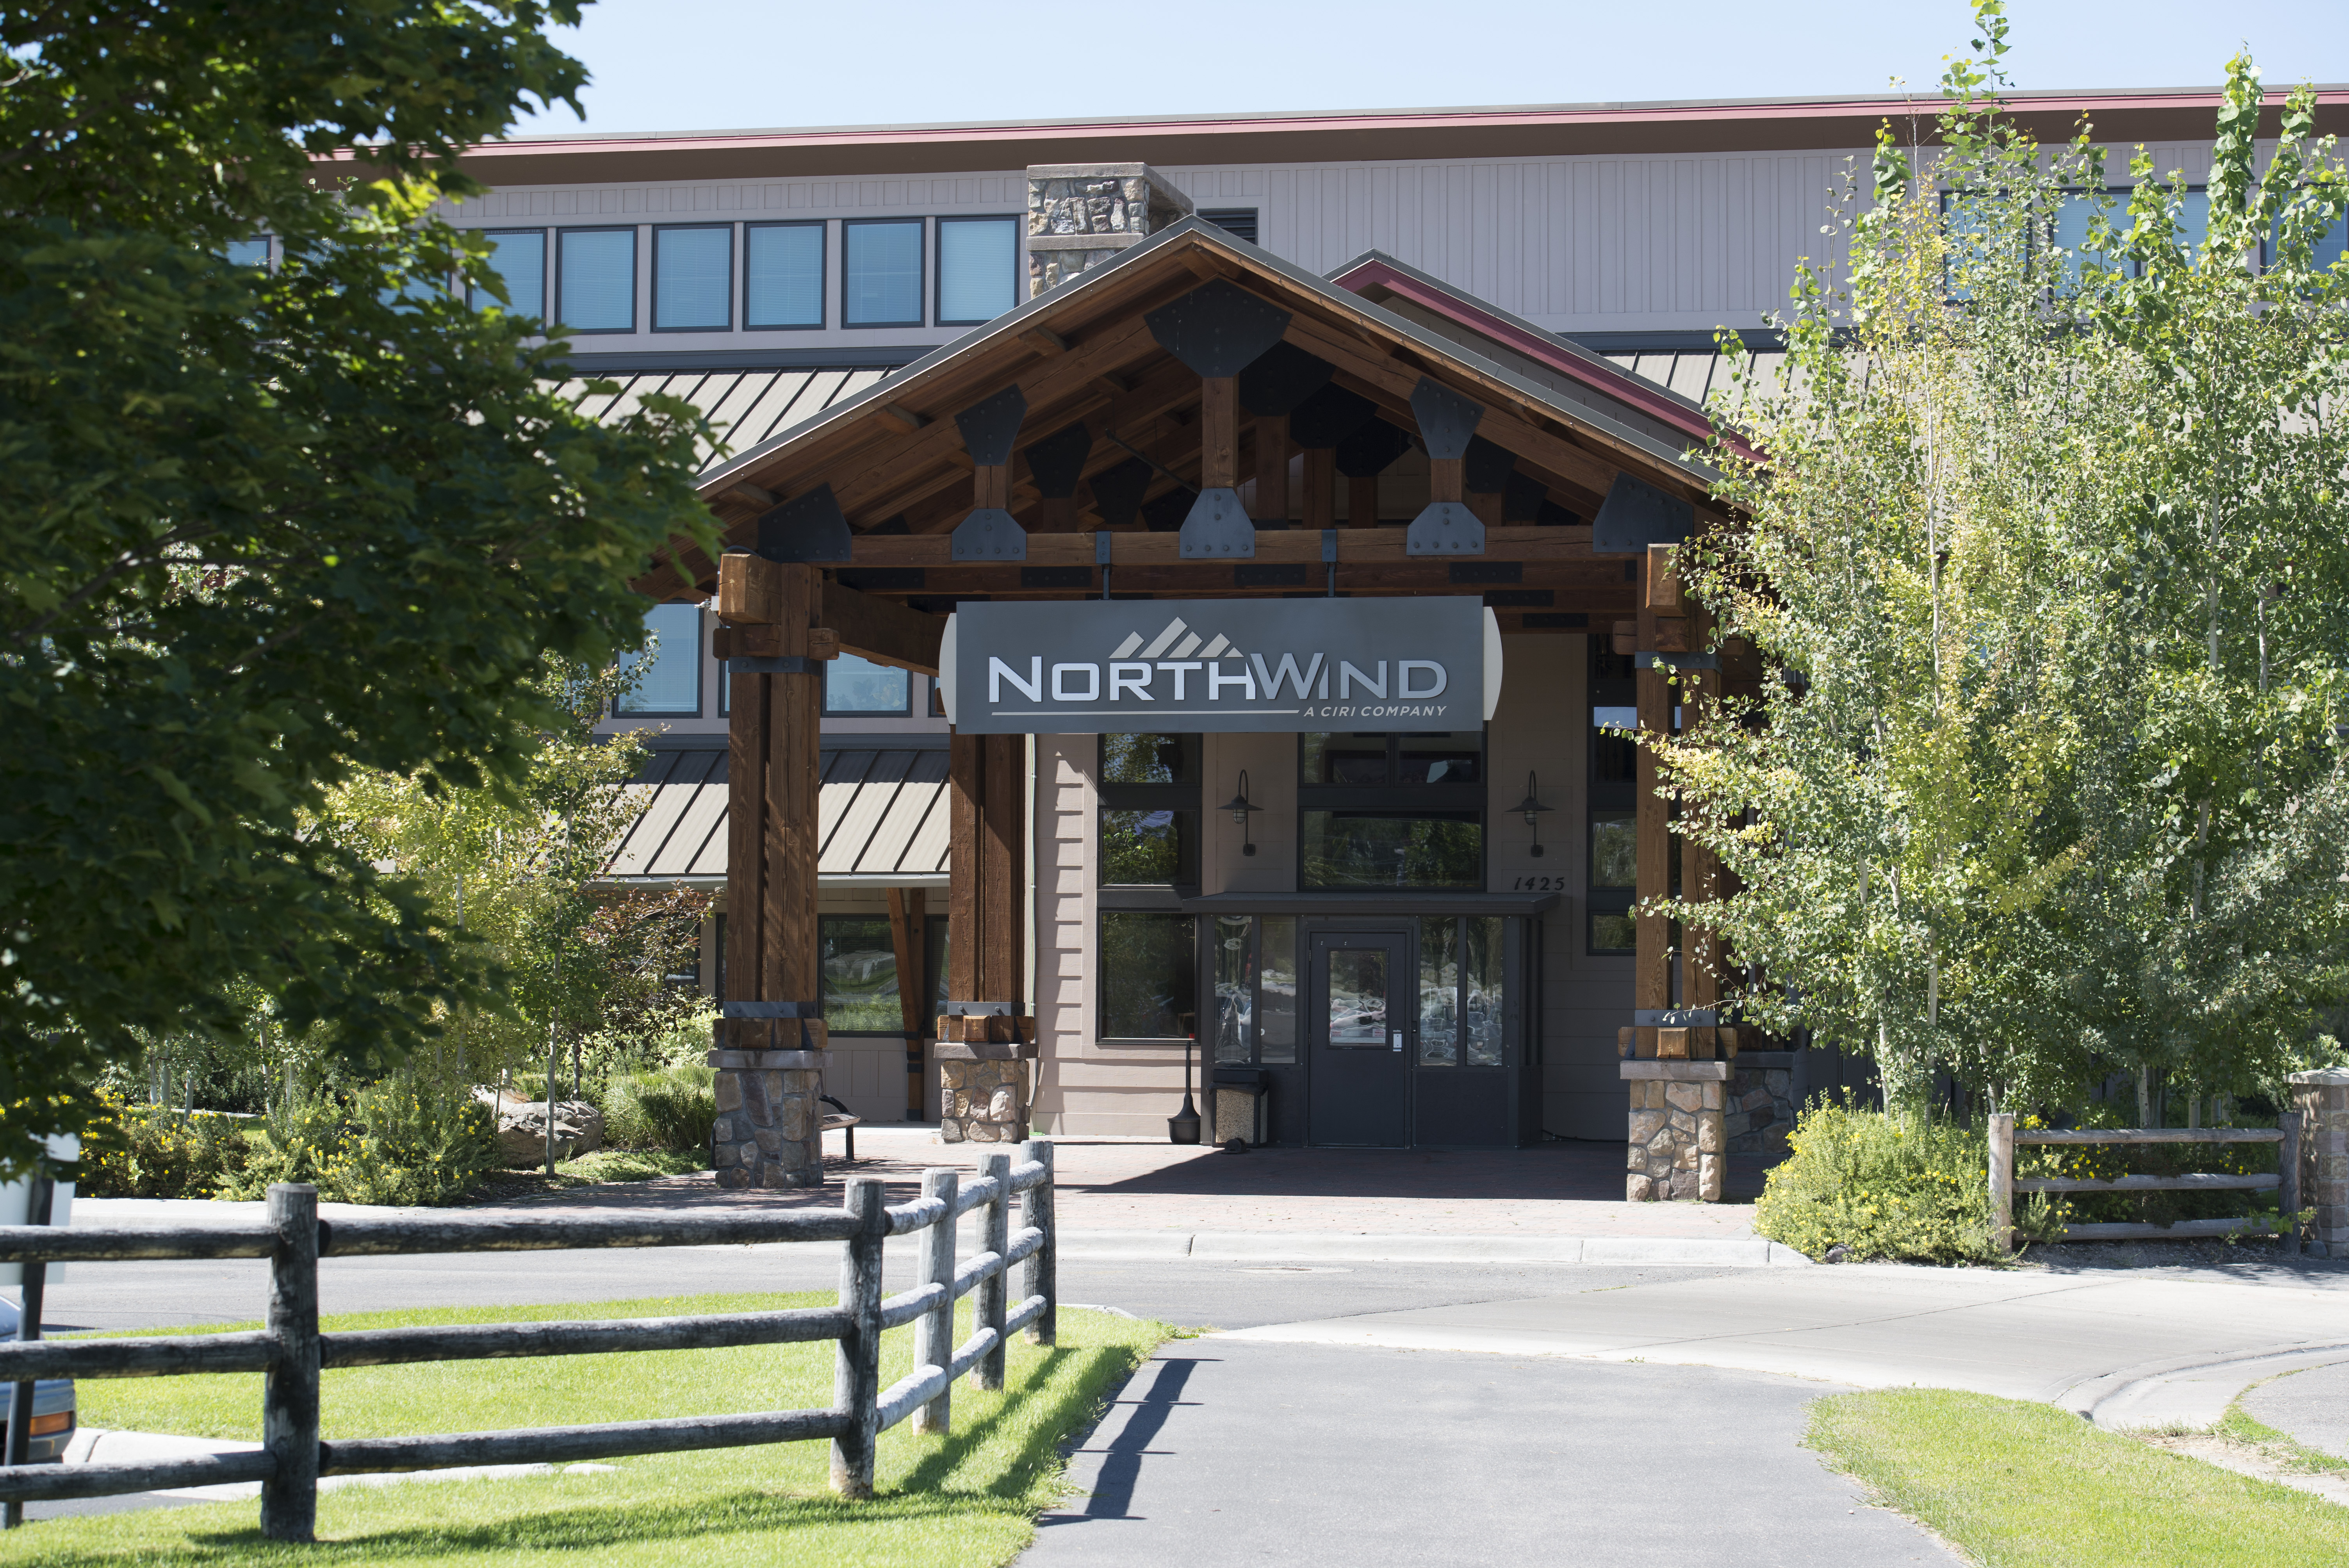 North Wind offices in Idaho Falls, Idaho. Photo by Jason Moore.